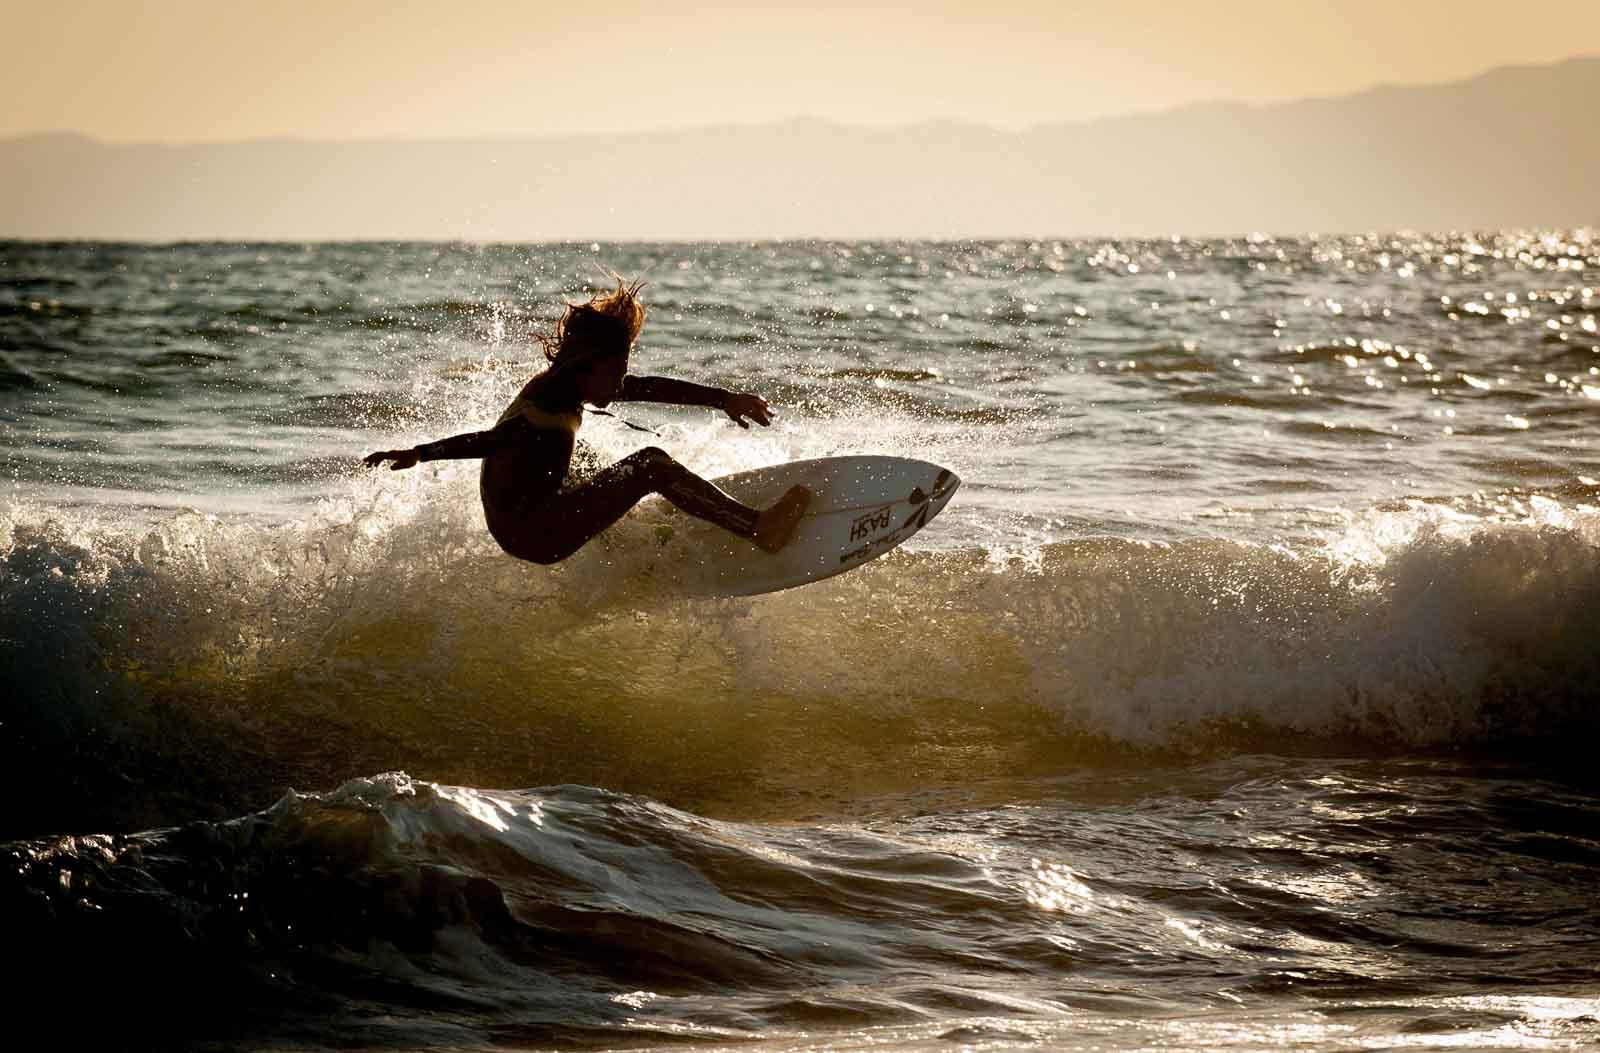 Surfer at Shonan Japan, home of the 2020 Summer Japan Olympic sailing events